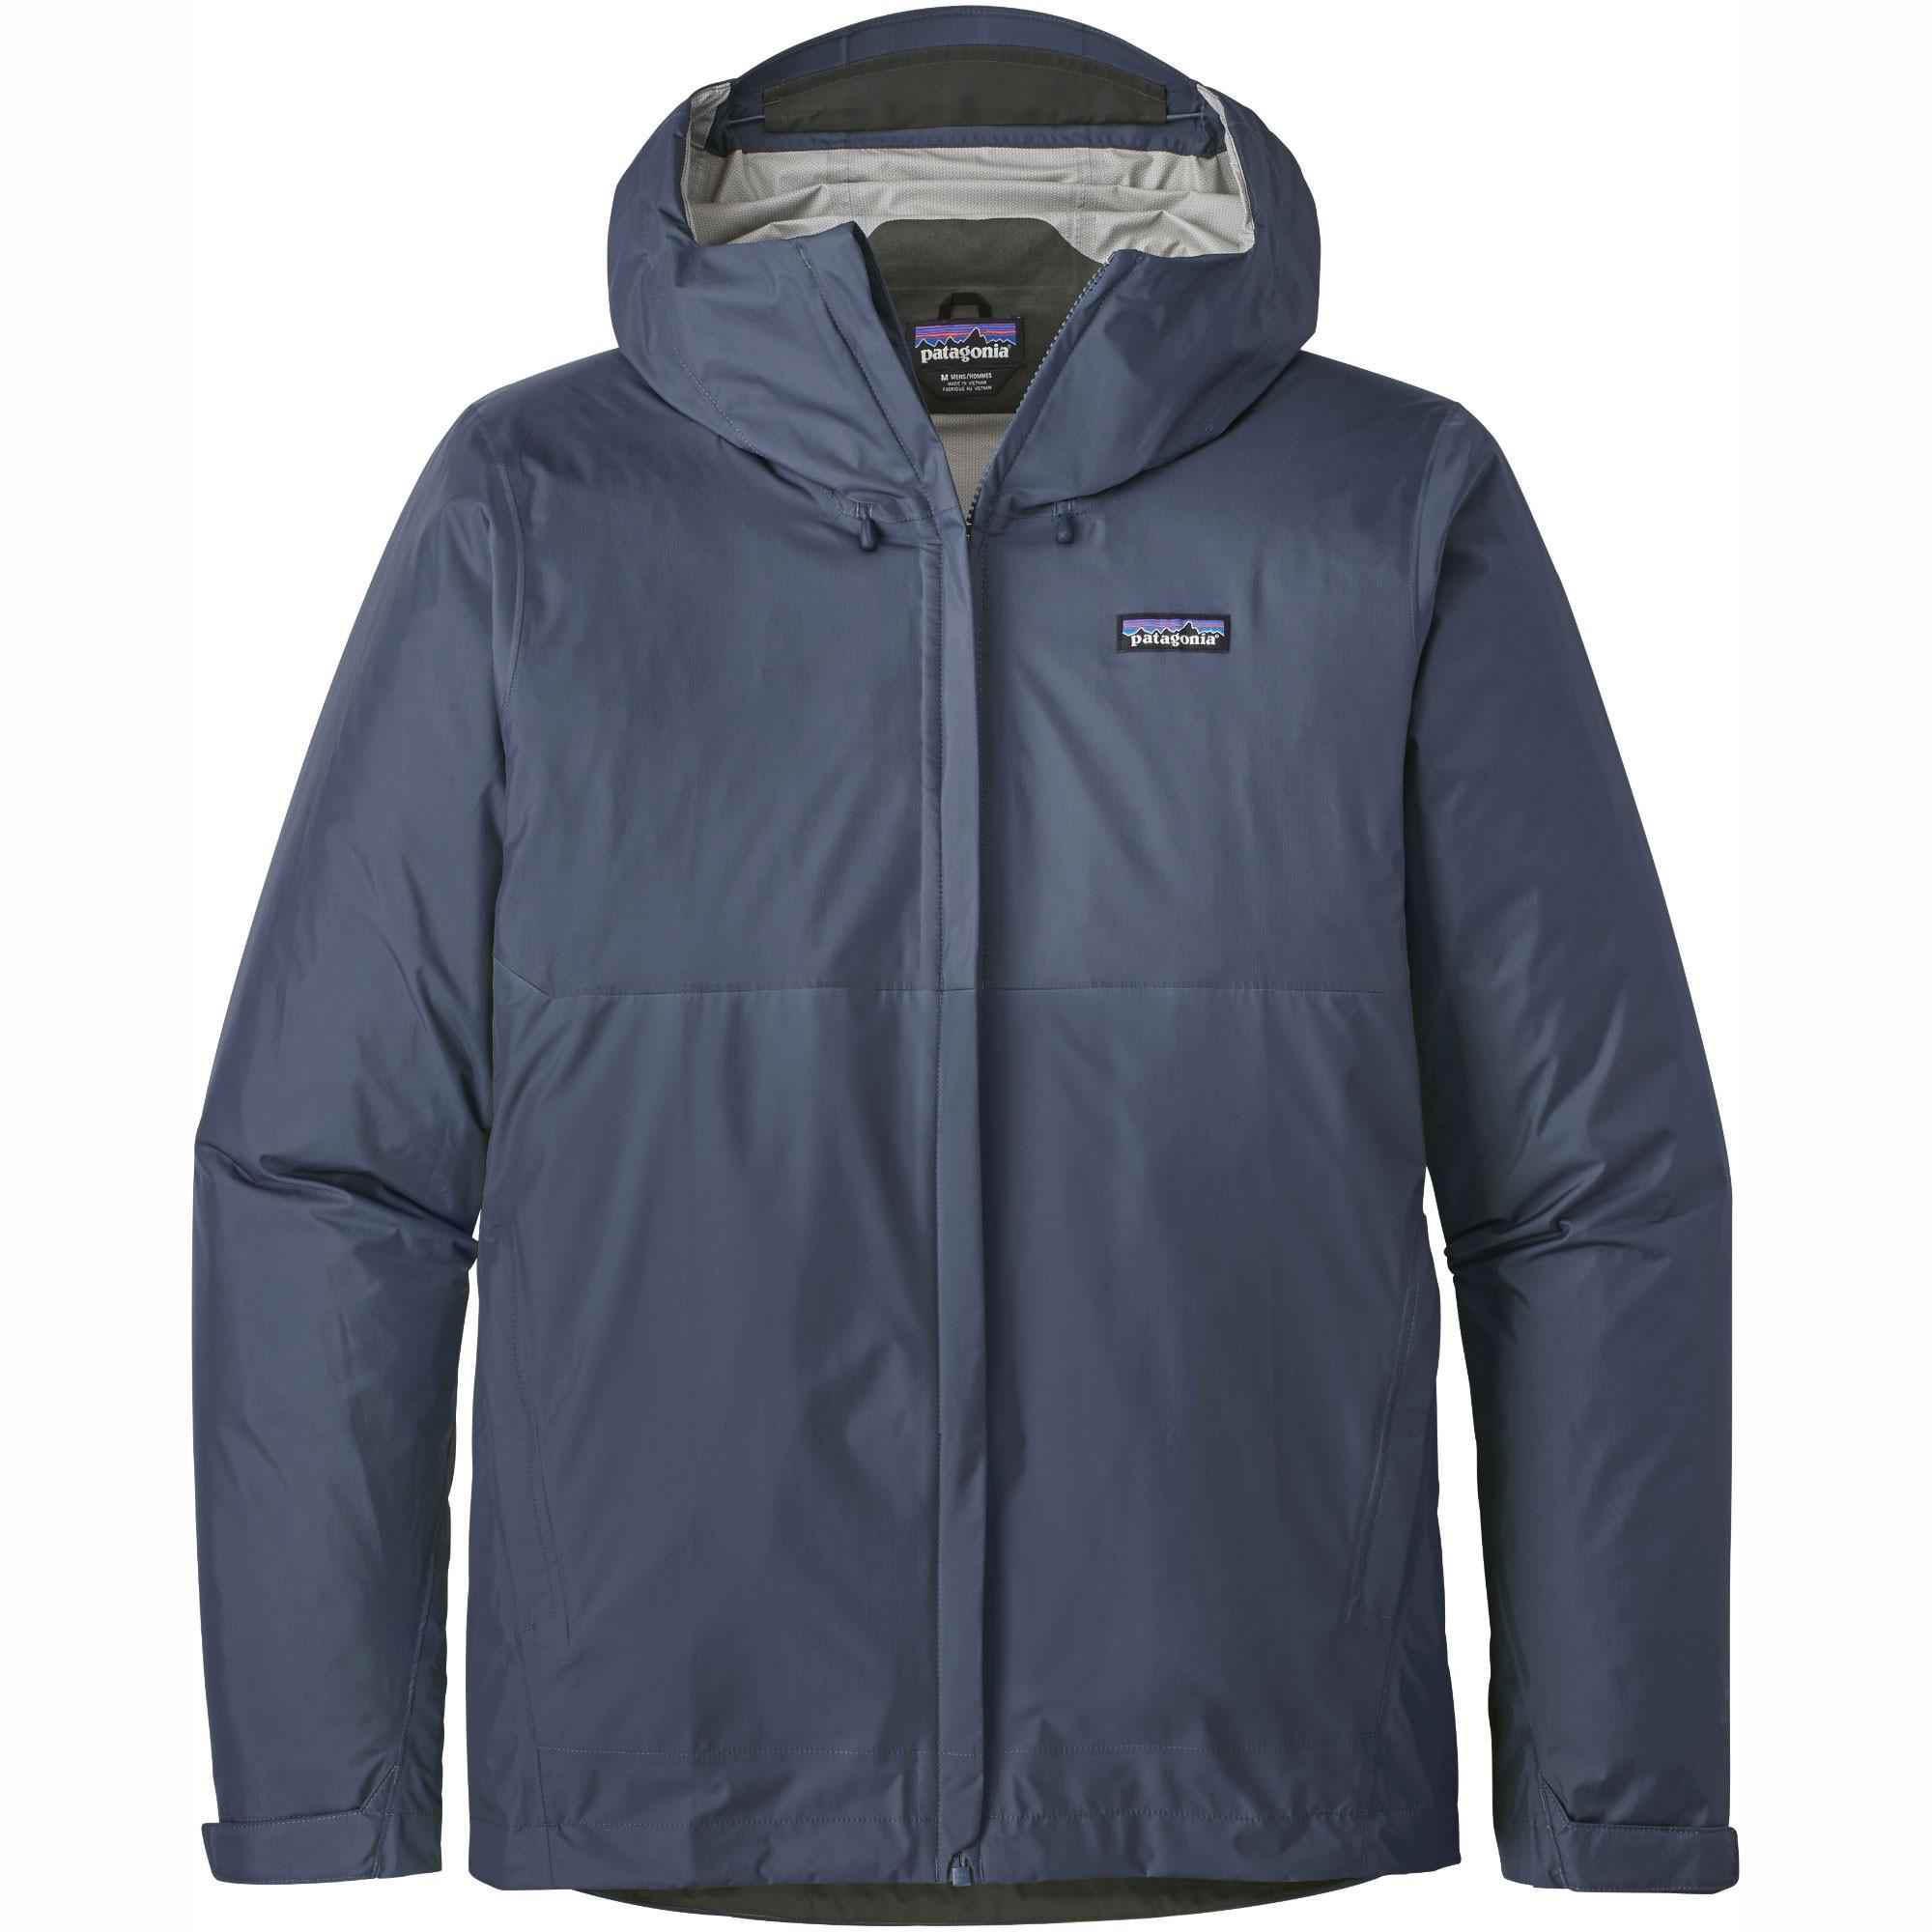 Patagonia-M-Torrentshell-Jacket-Dolomite-Blue-S18.jpg